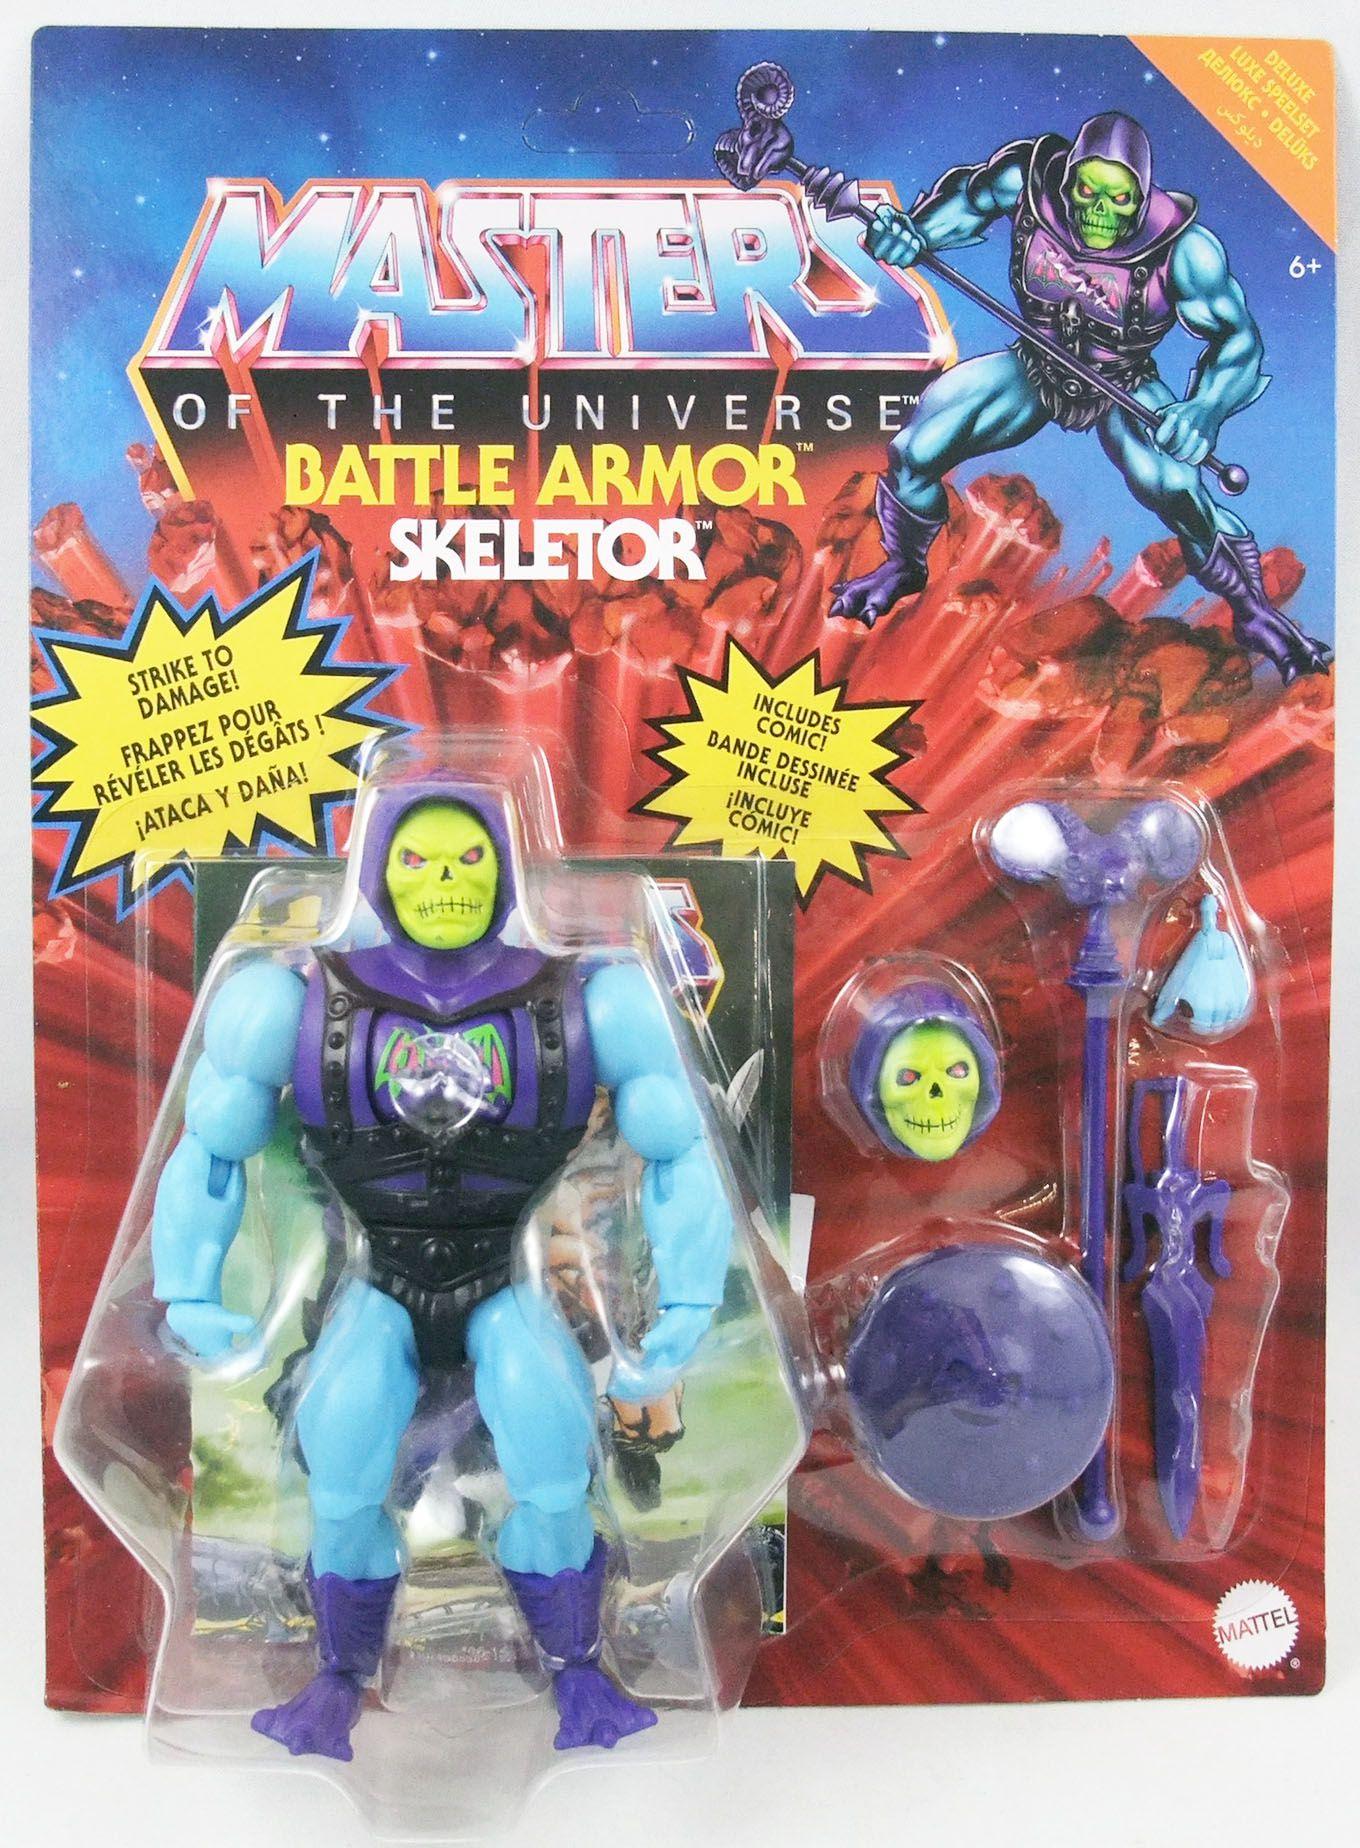 Les Maitres de l\'Univers Origins - Battle Armor Skeletor (Skeletor l\'Invincible)